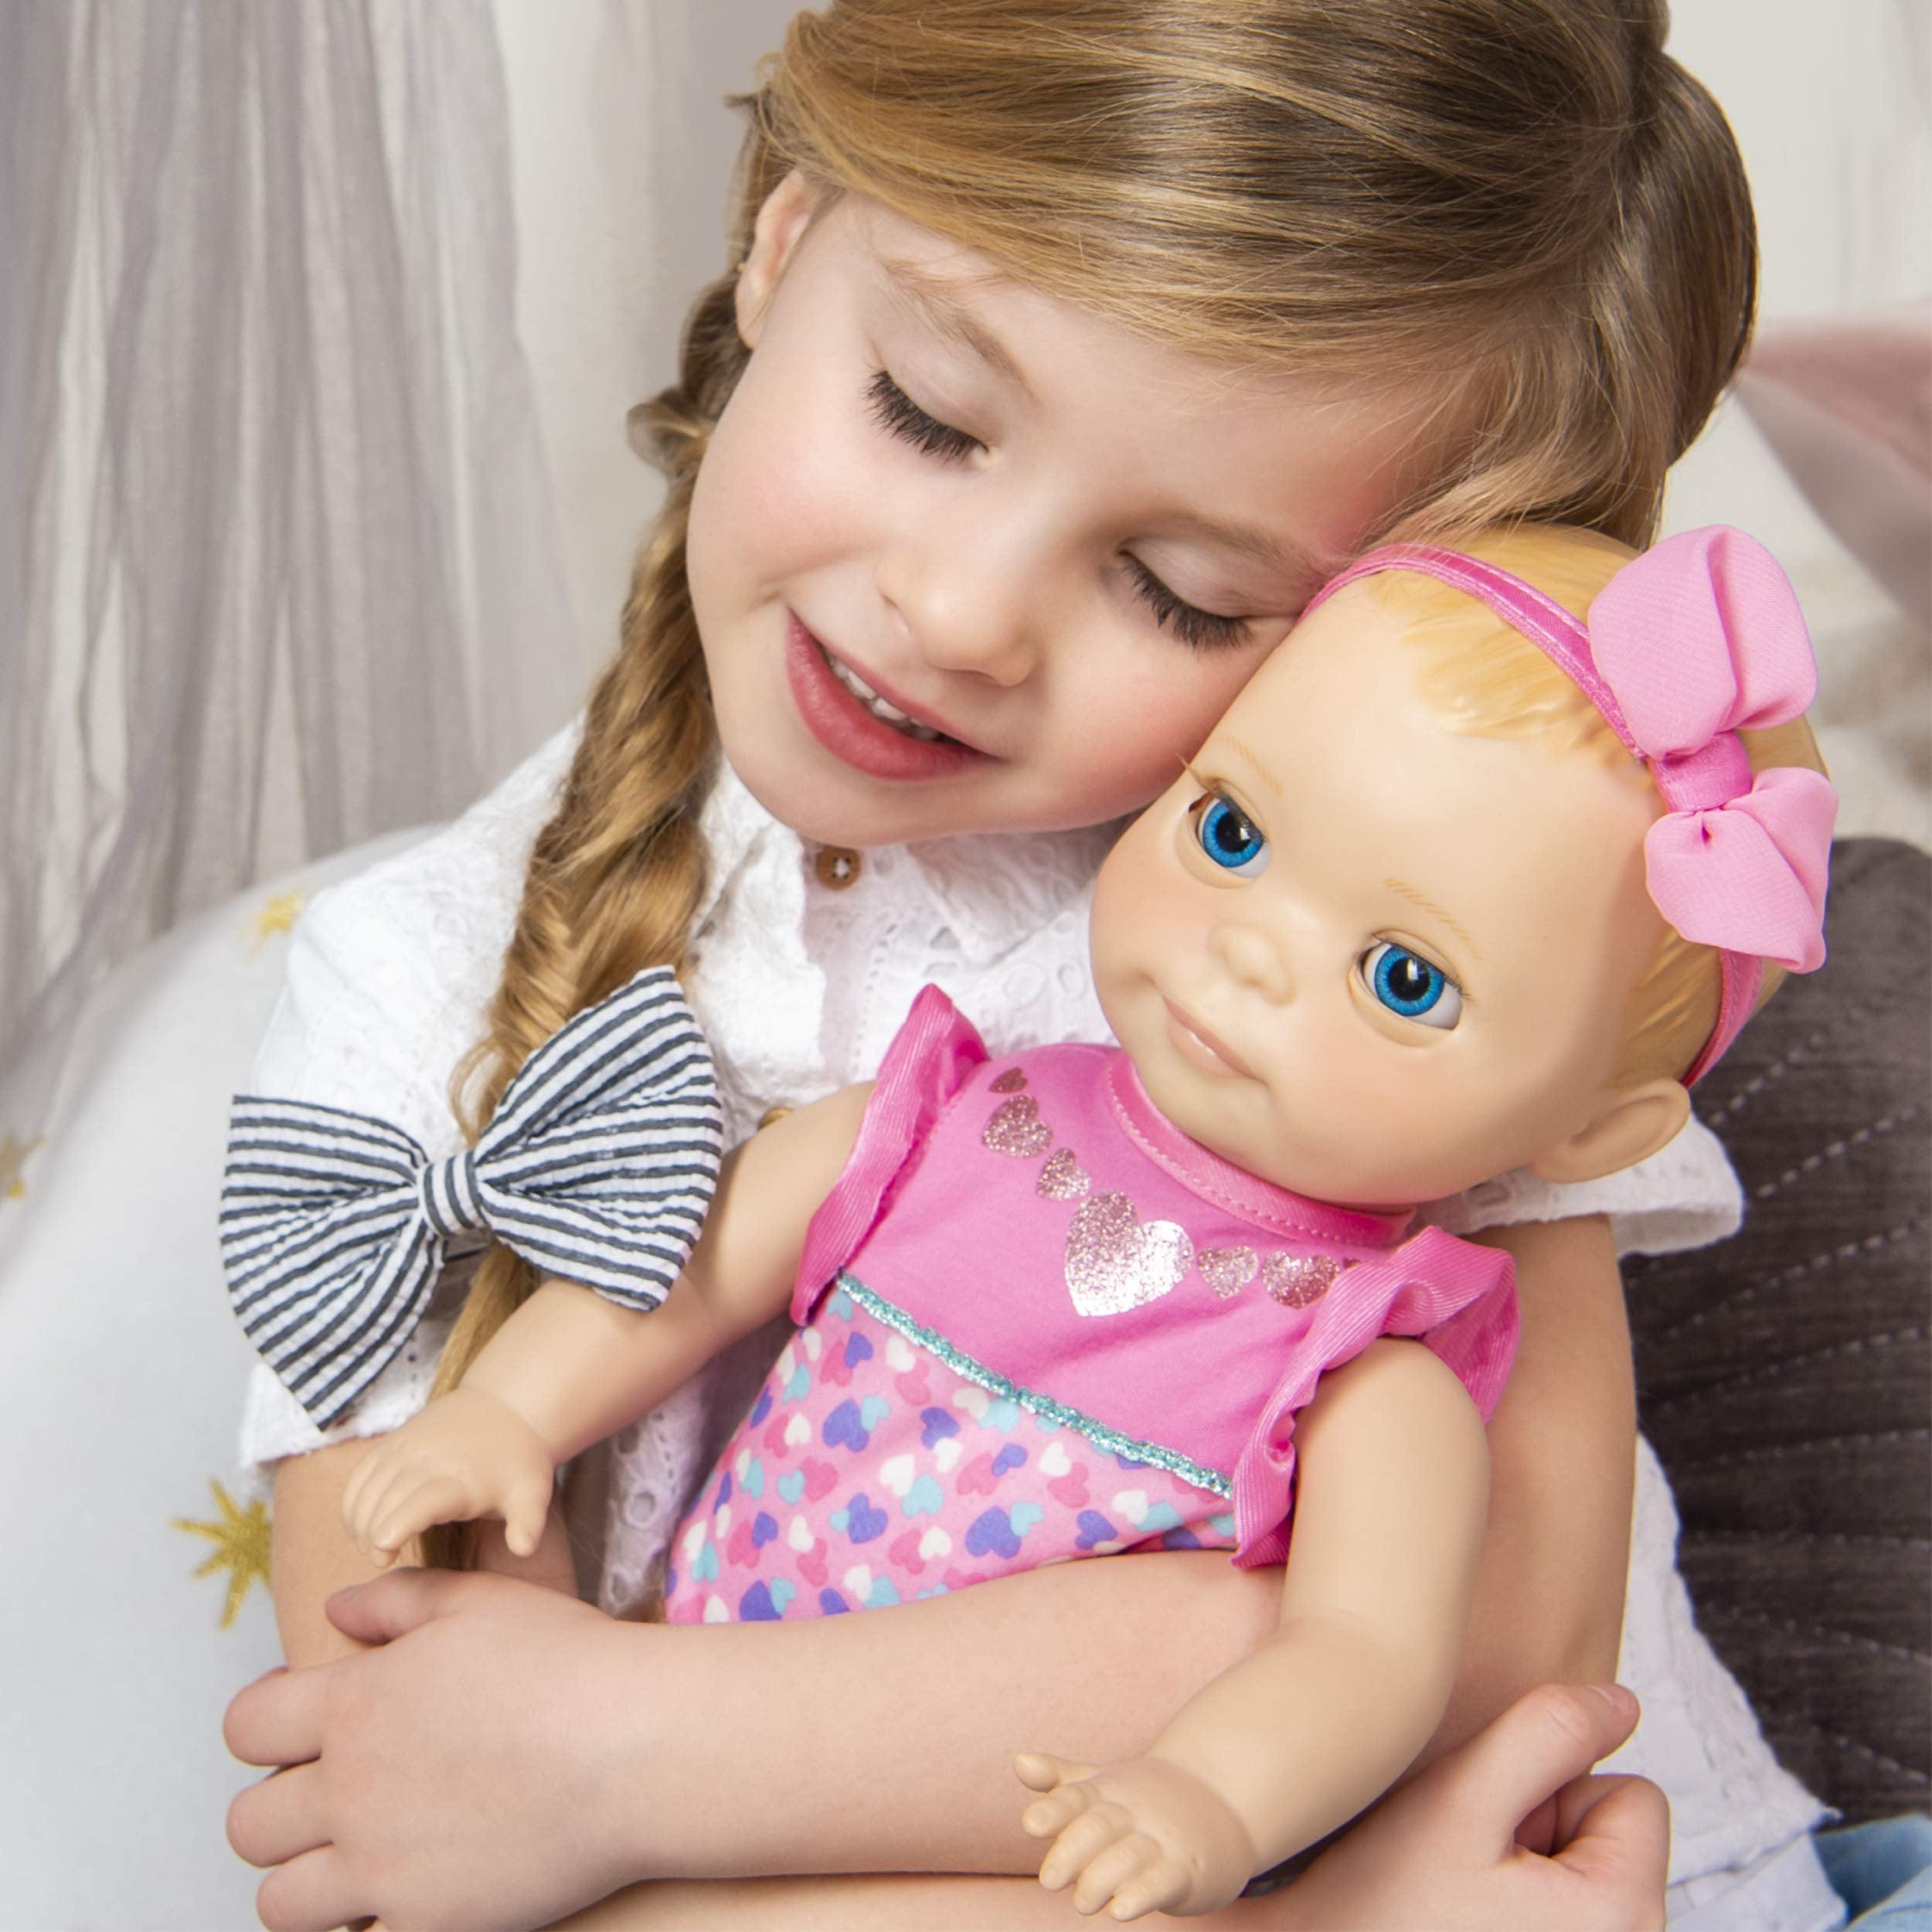 Brand New Luvabella Newborn Interactive Baby Doll Blonde Hair